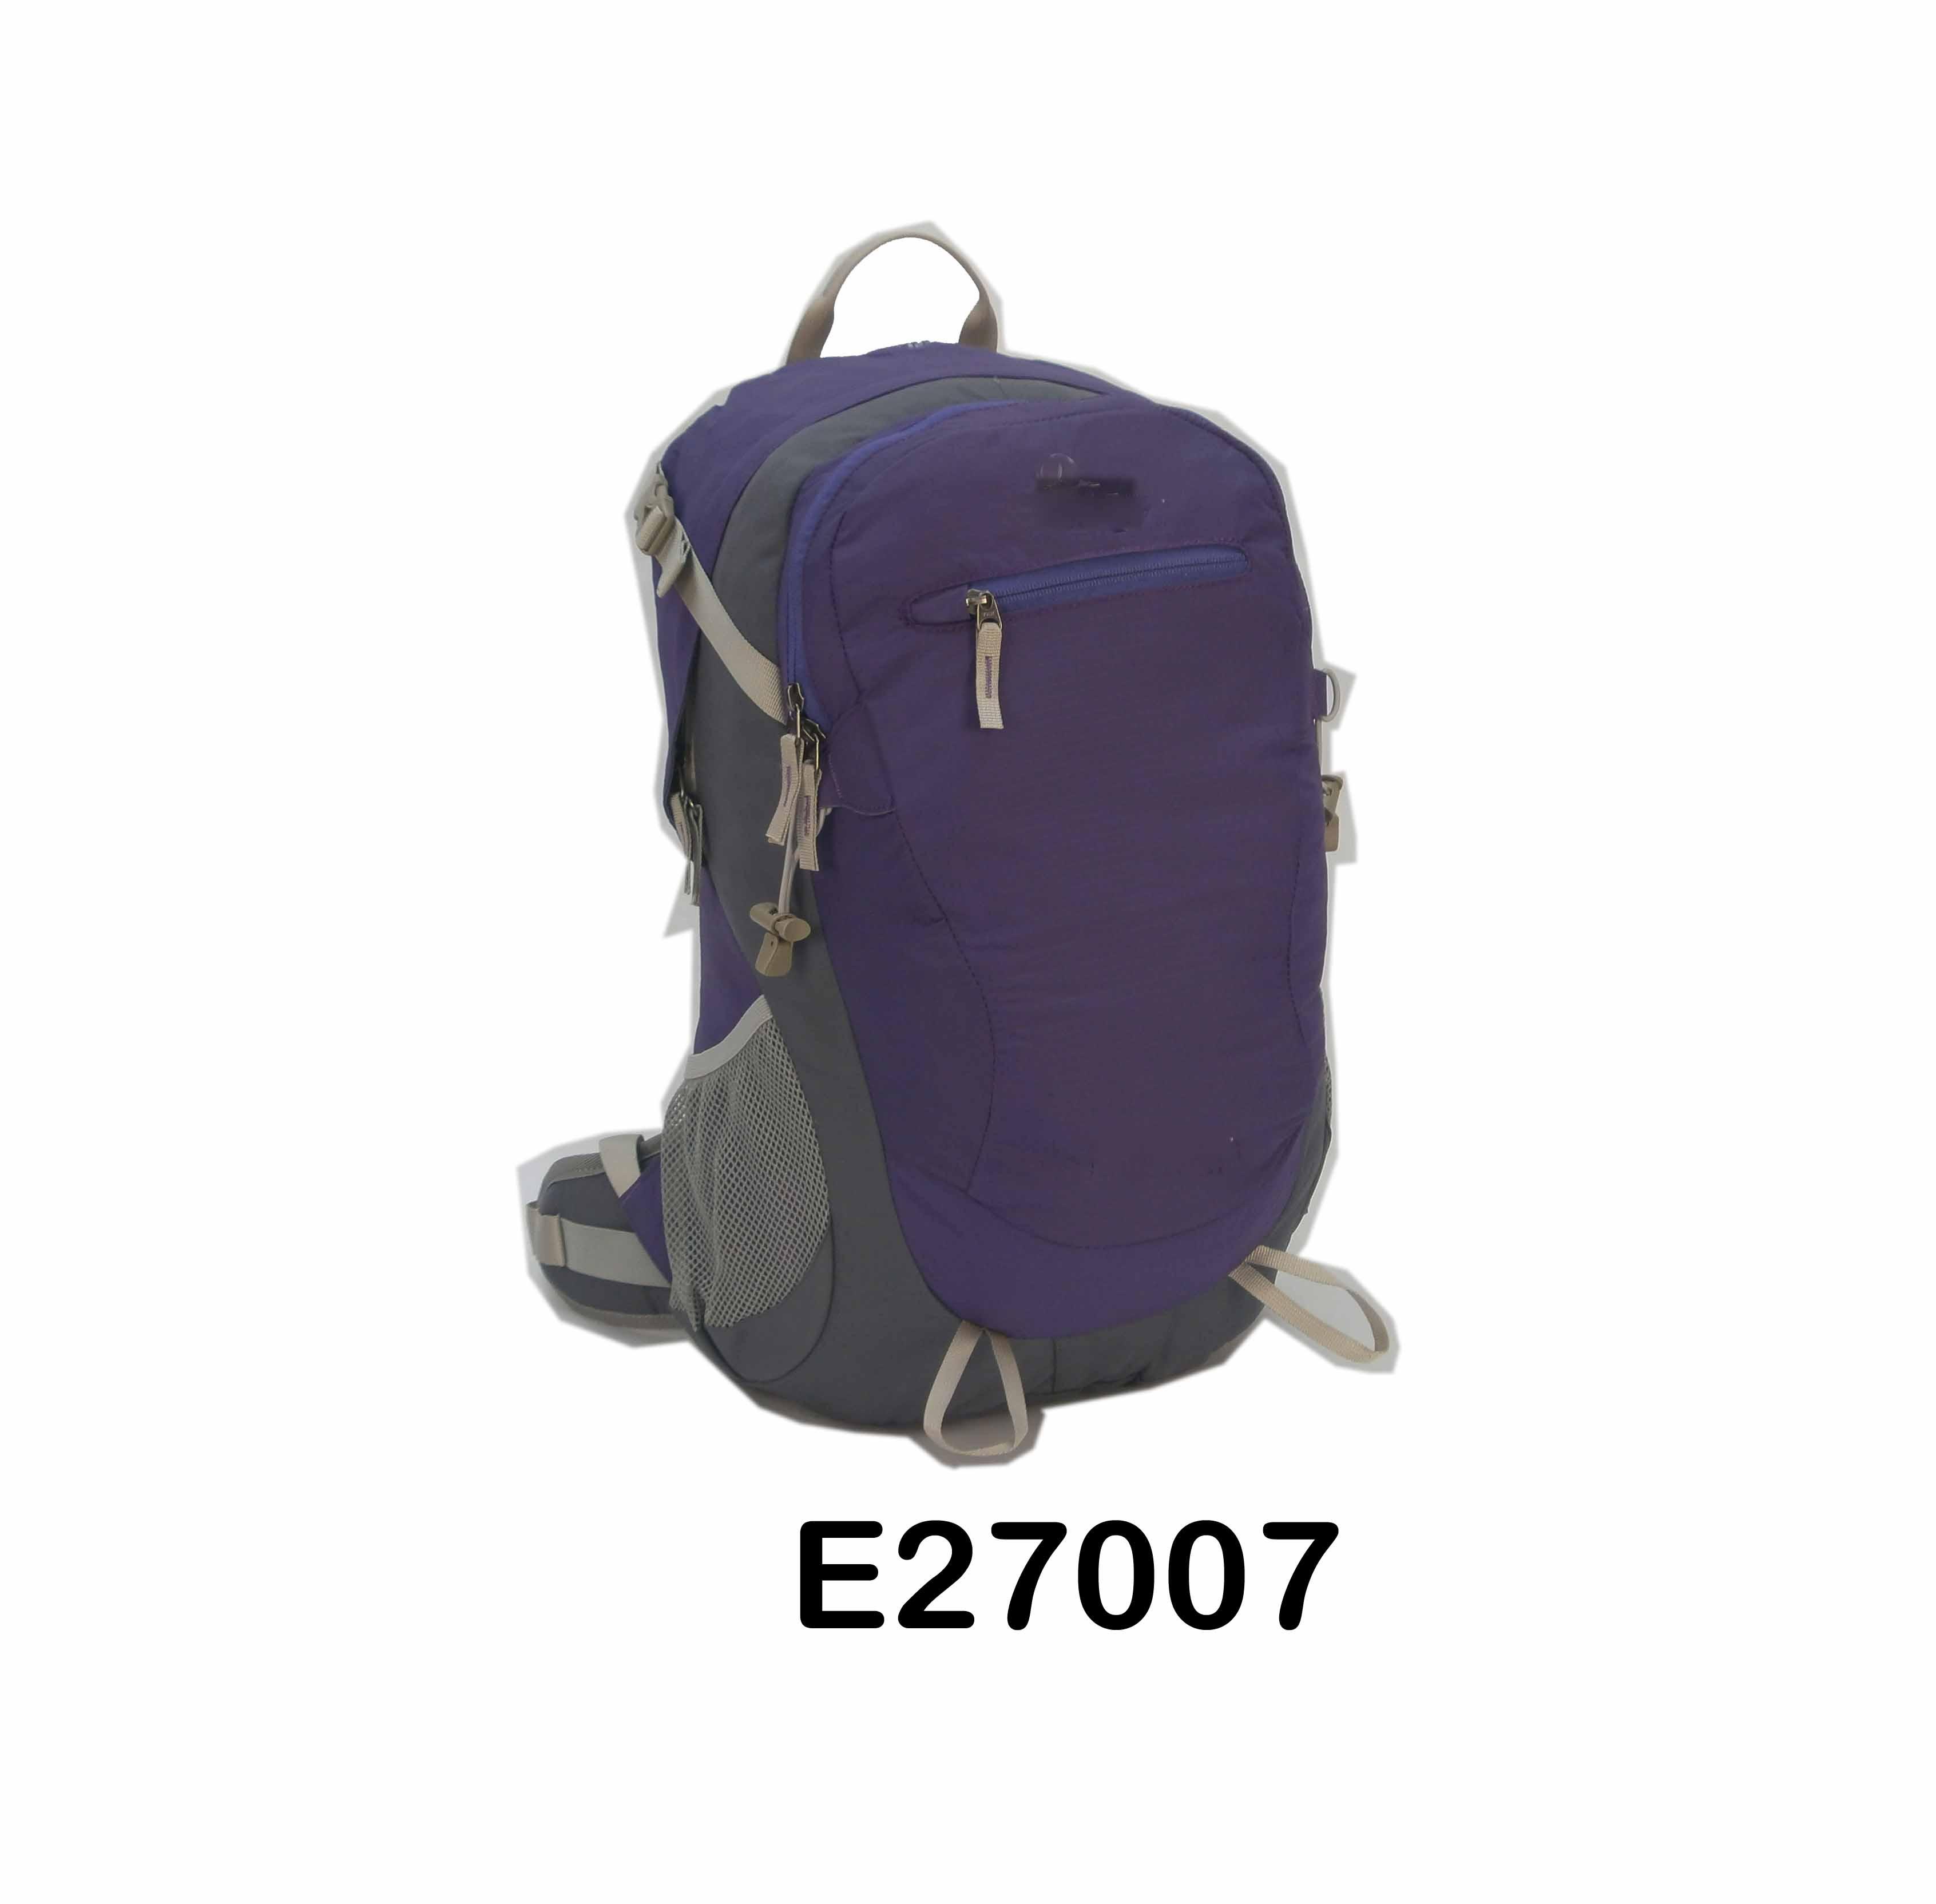 E27007